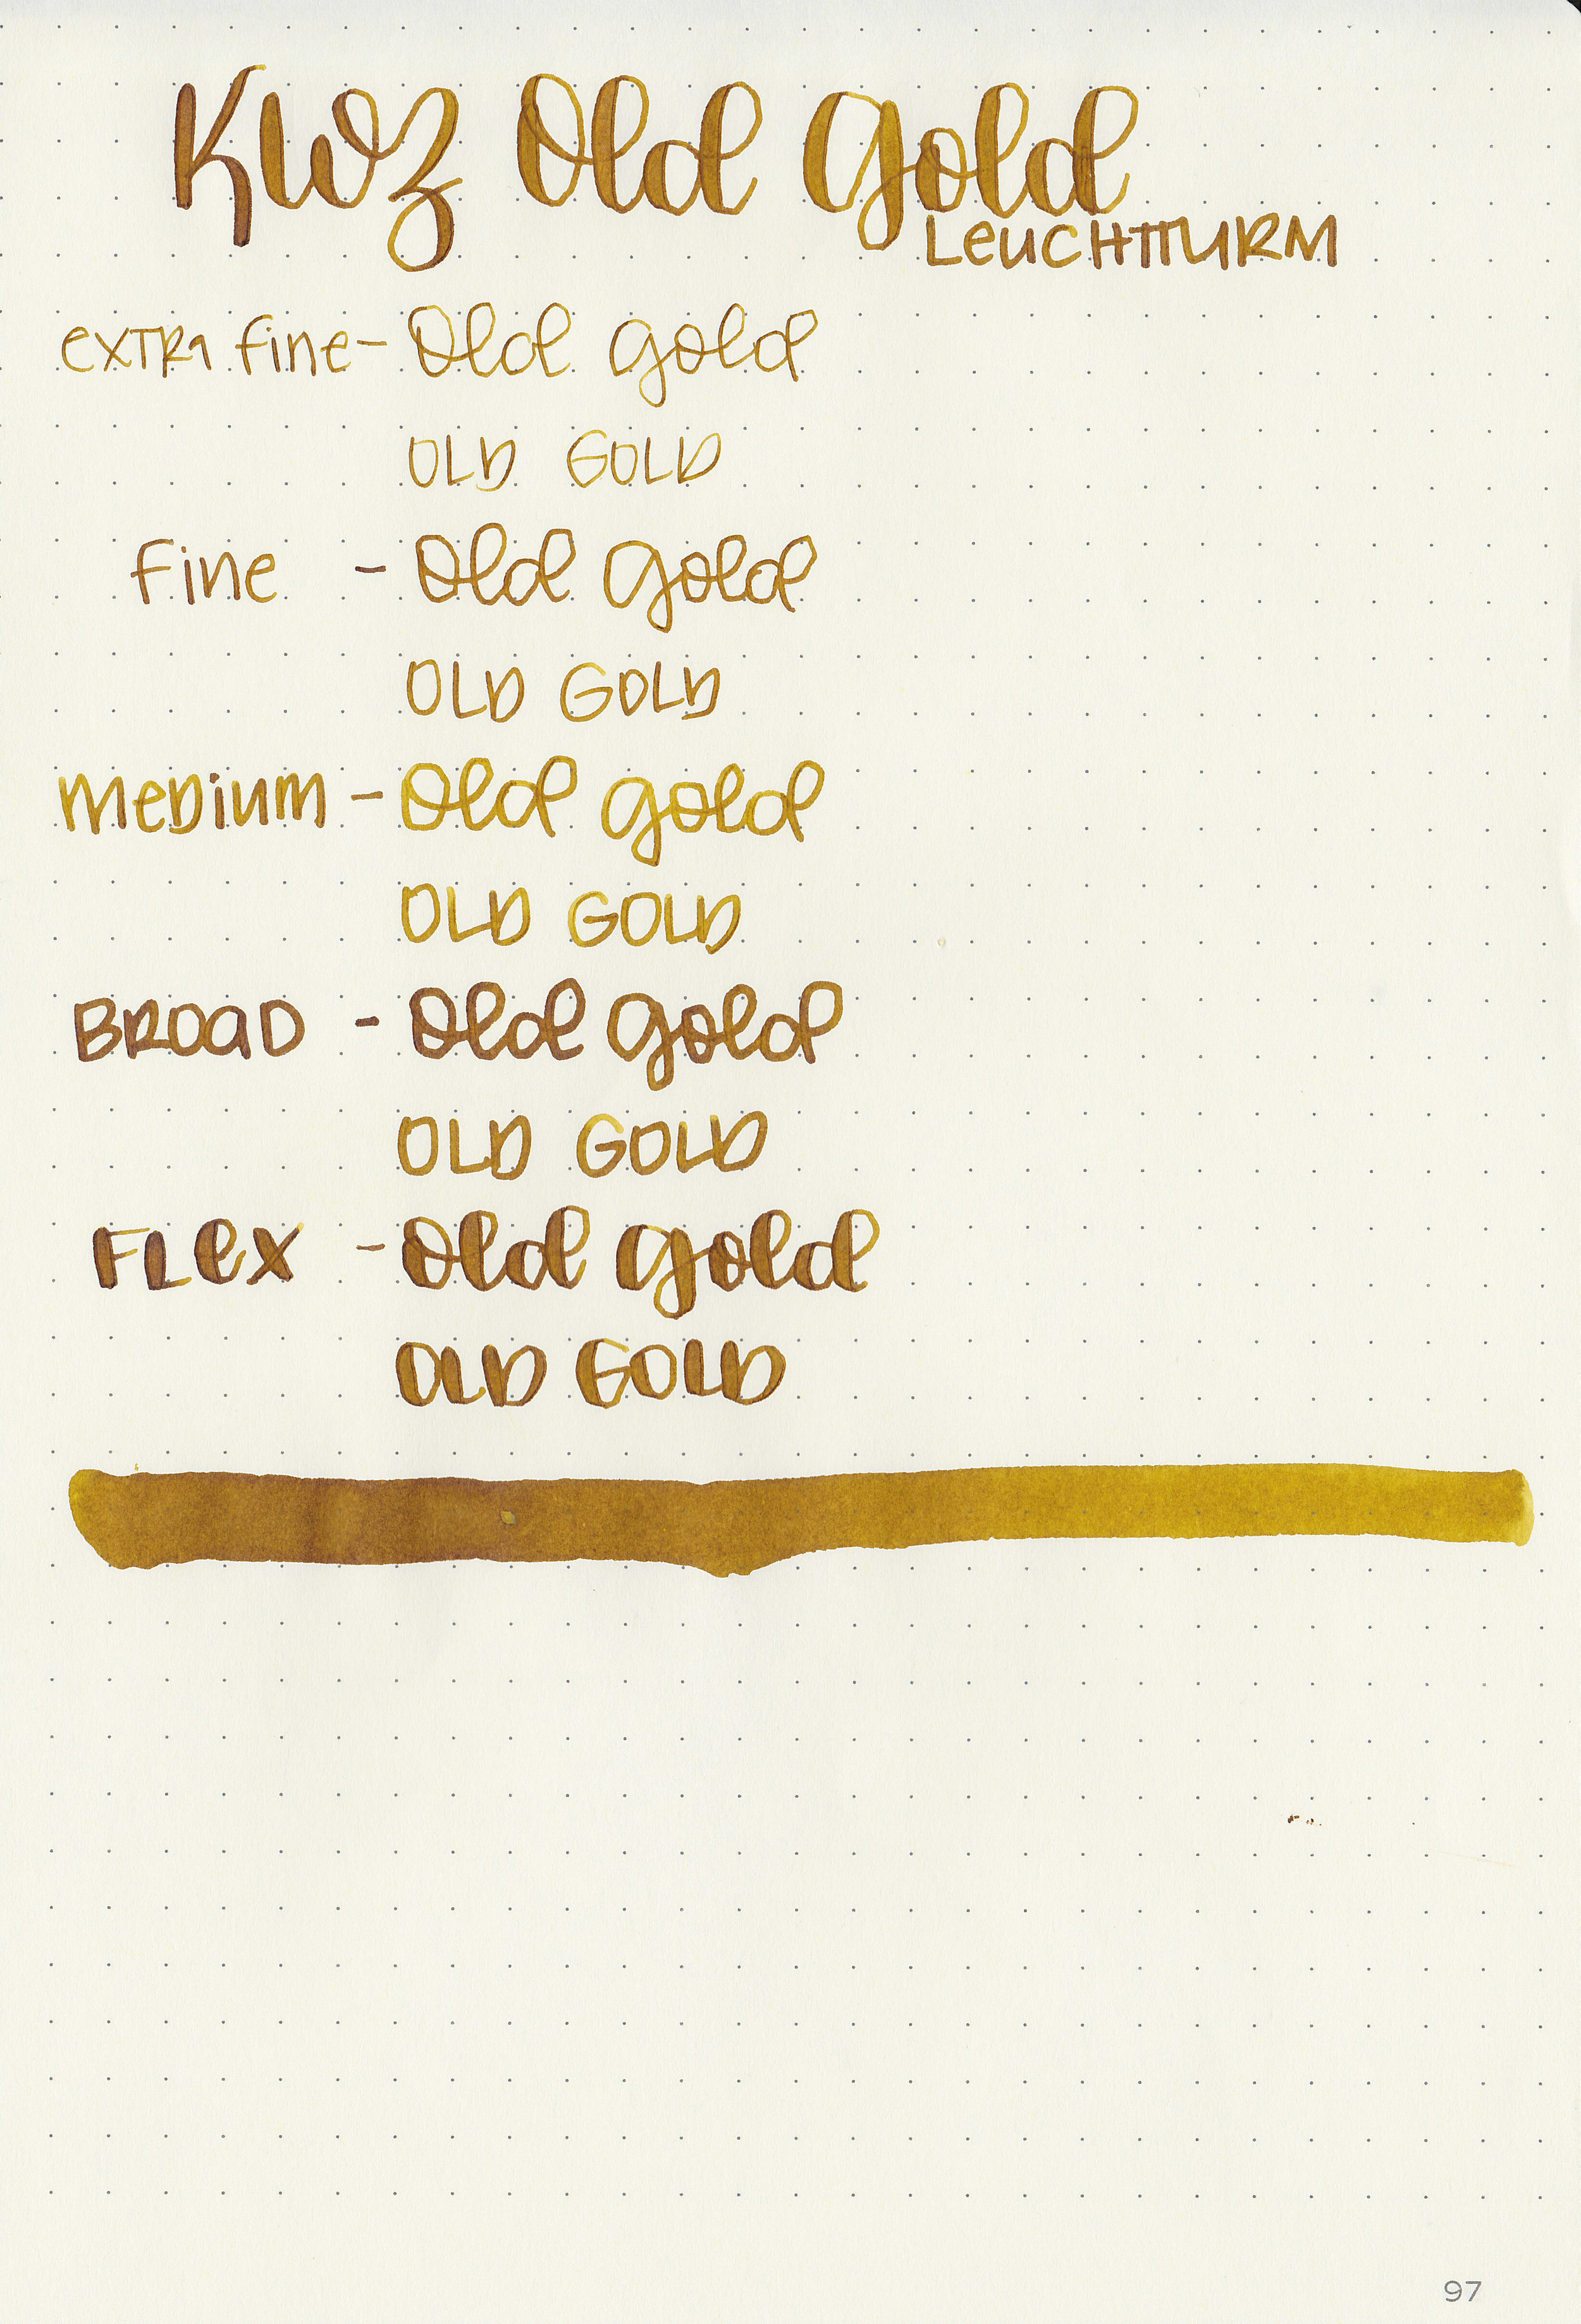 kwz-old-gold-12.jpg